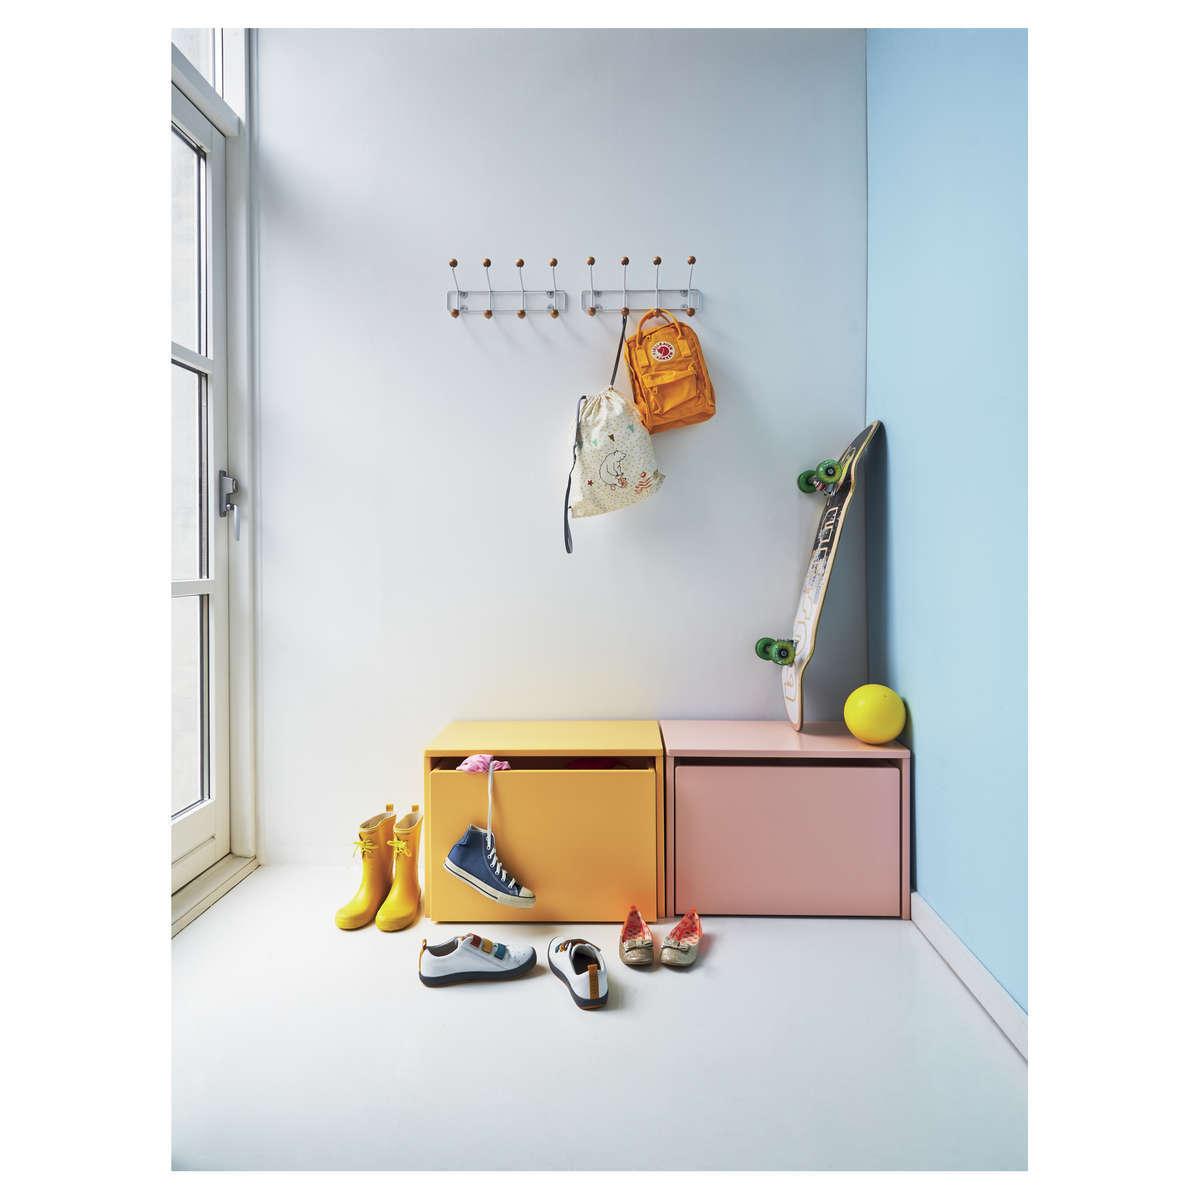 flexa coffre de rangement play jaune rangement jouet flexa sur l 39 armoire de b b. Black Bedroom Furniture Sets. Home Design Ideas